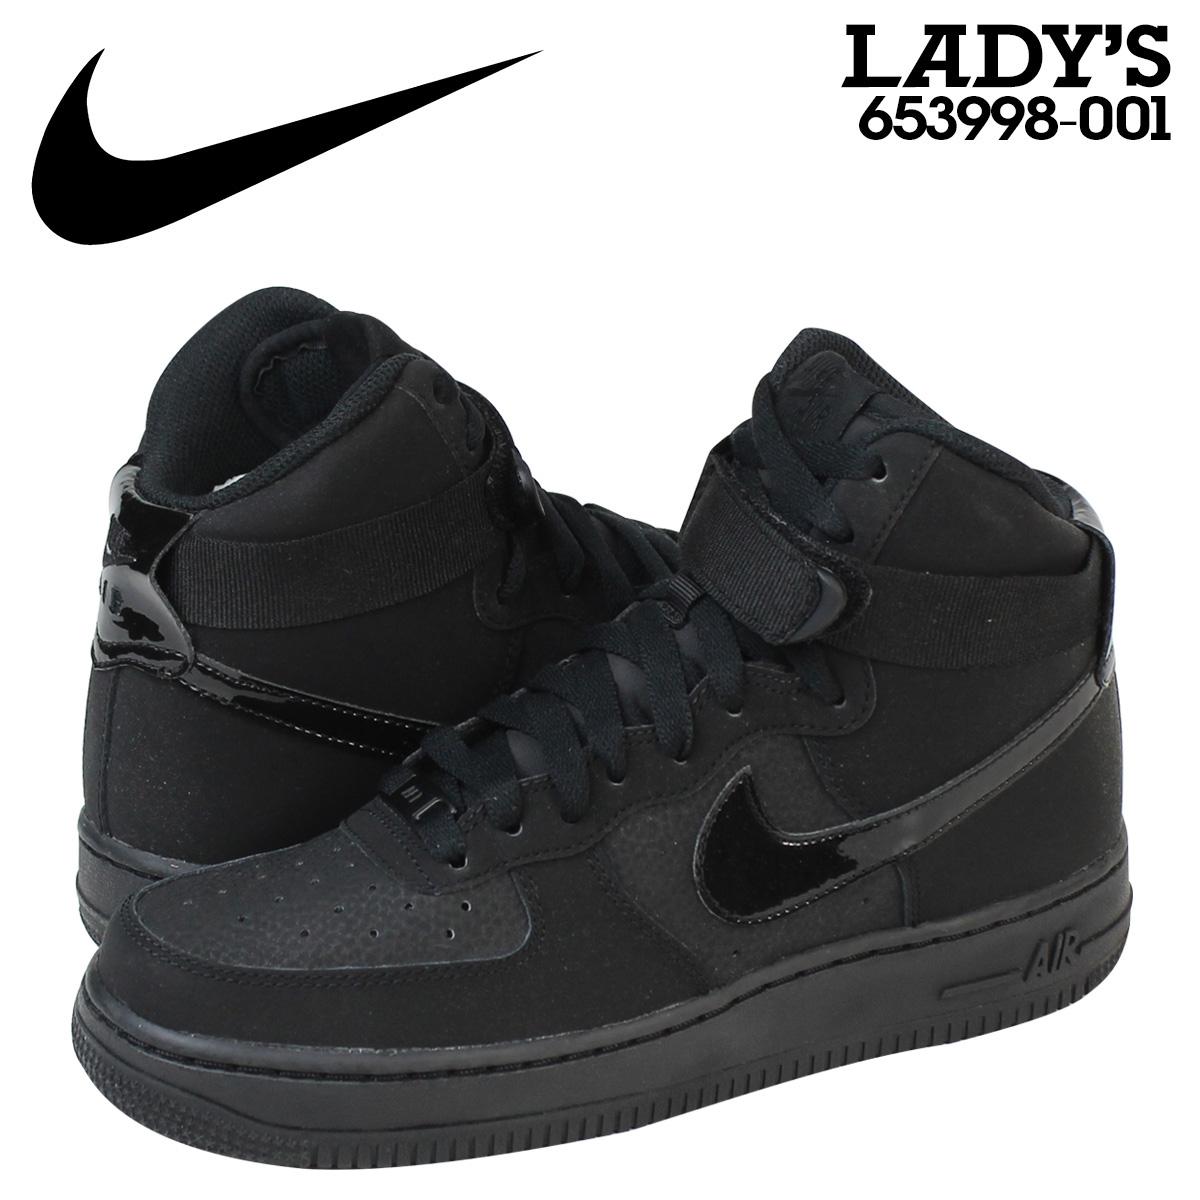 Point 2 x Nike NIKE women s AIR FORCE 1 HI GS sneakers air force 1 Hi  653998-001 black  9 15 new in stock  8e9c0efcf0